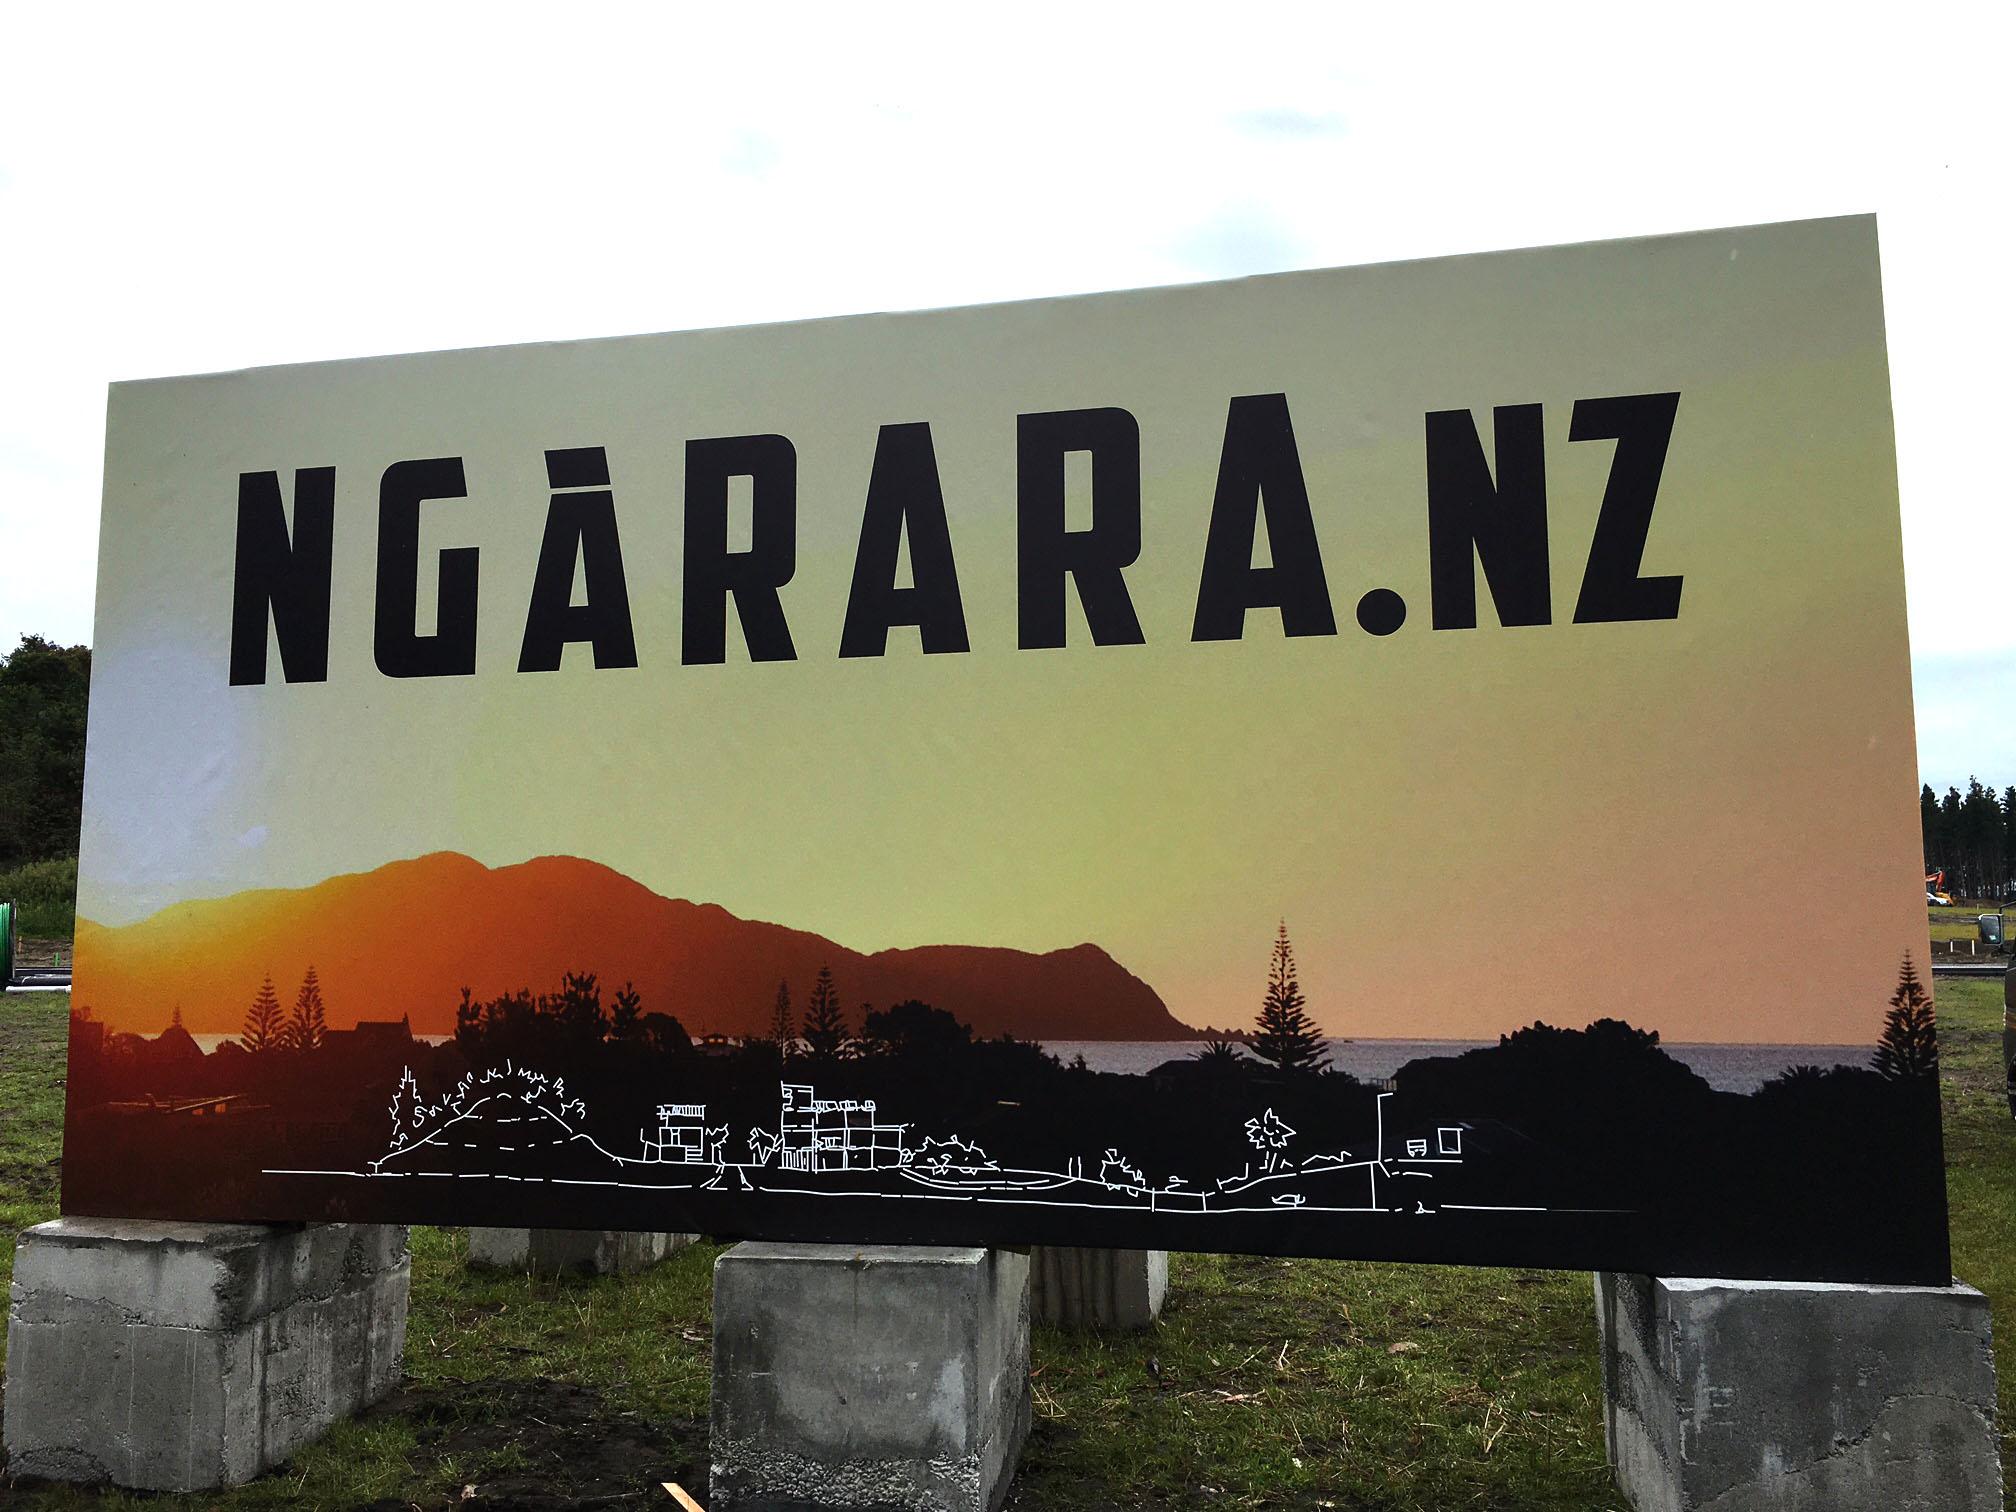 NGARARA